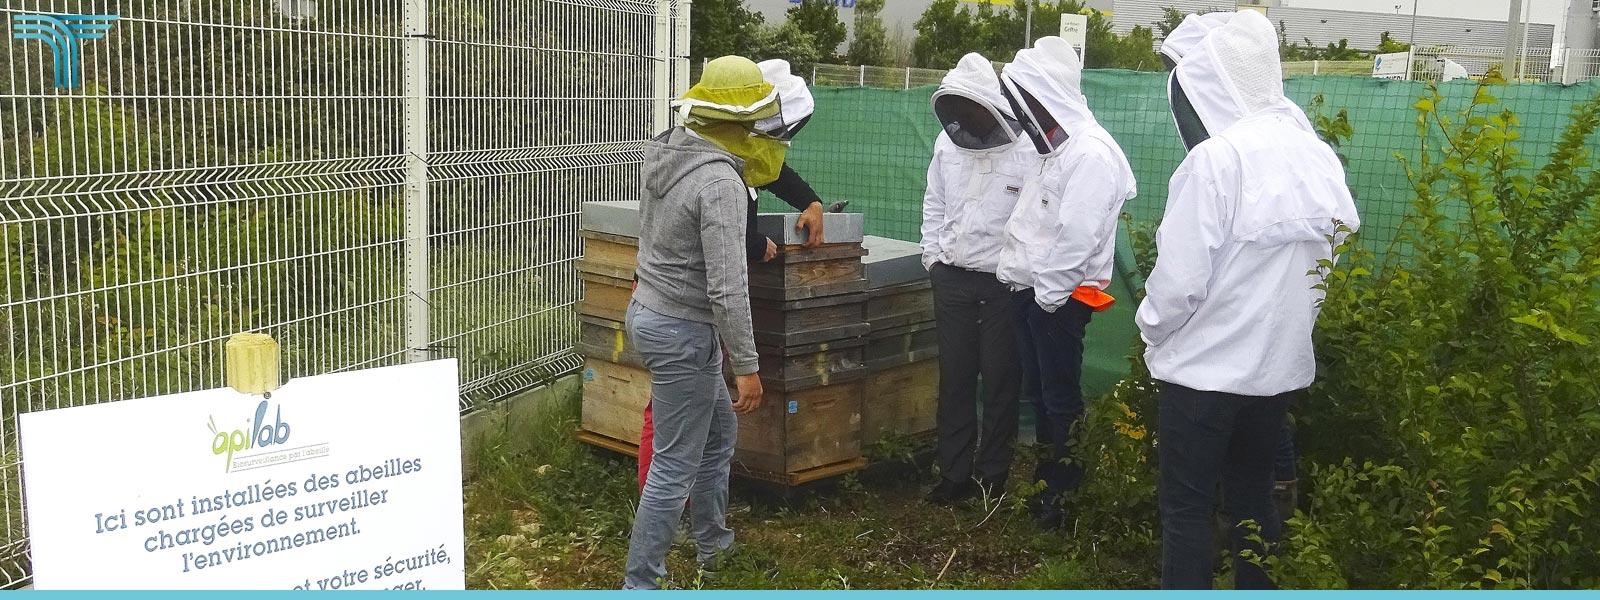 Programme collectif de bio-surveillance environnementale apicole